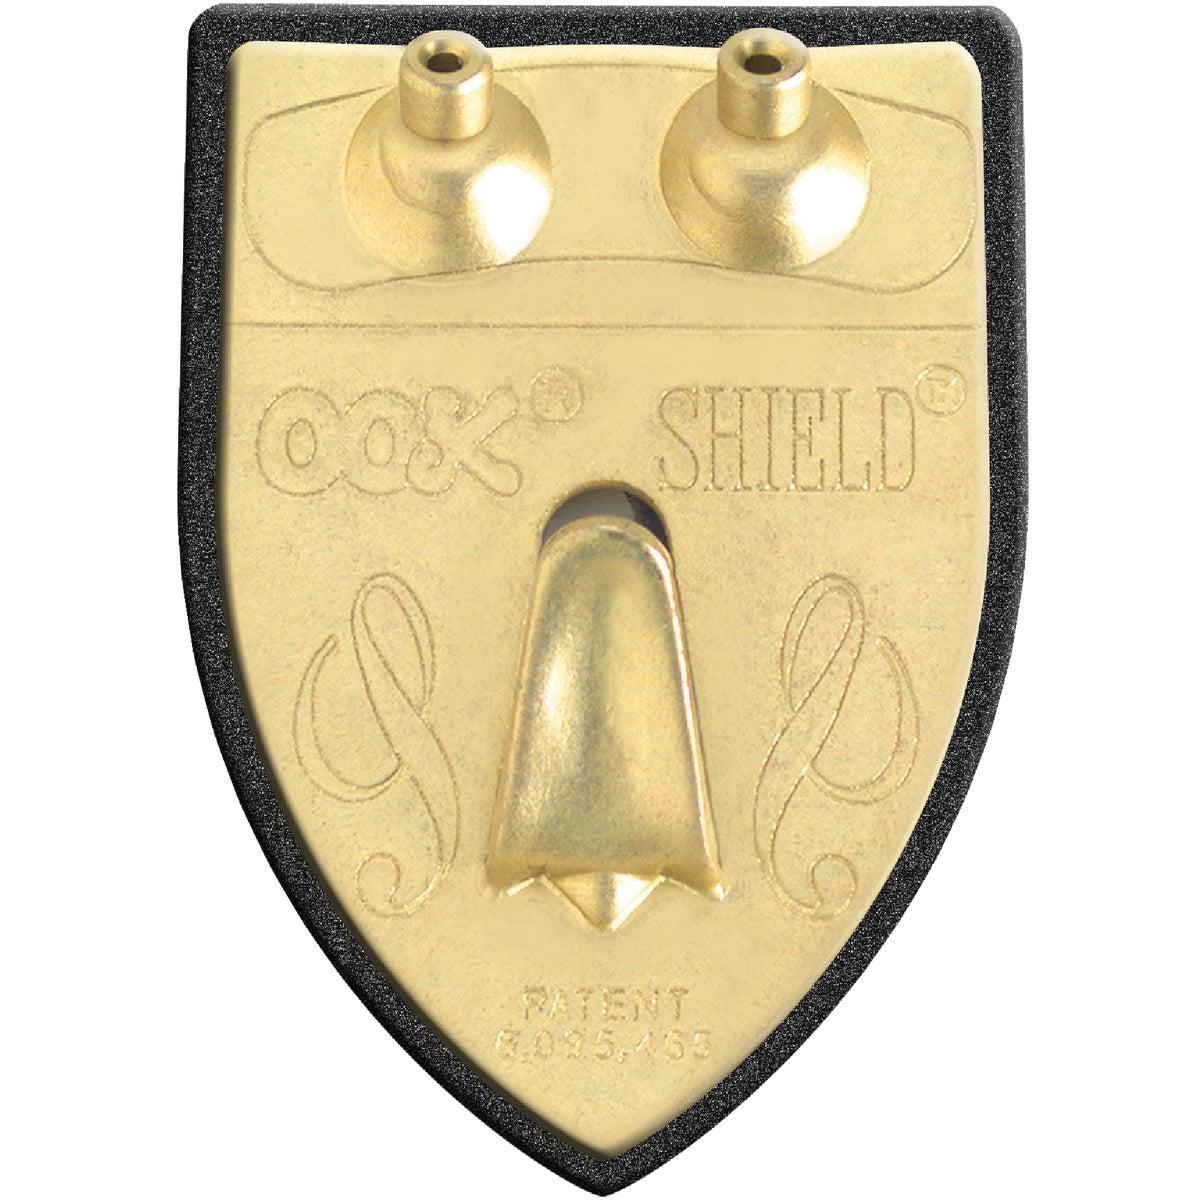 50LB SHLD PICTURE HANGER - 533086 by Hillman Fastener